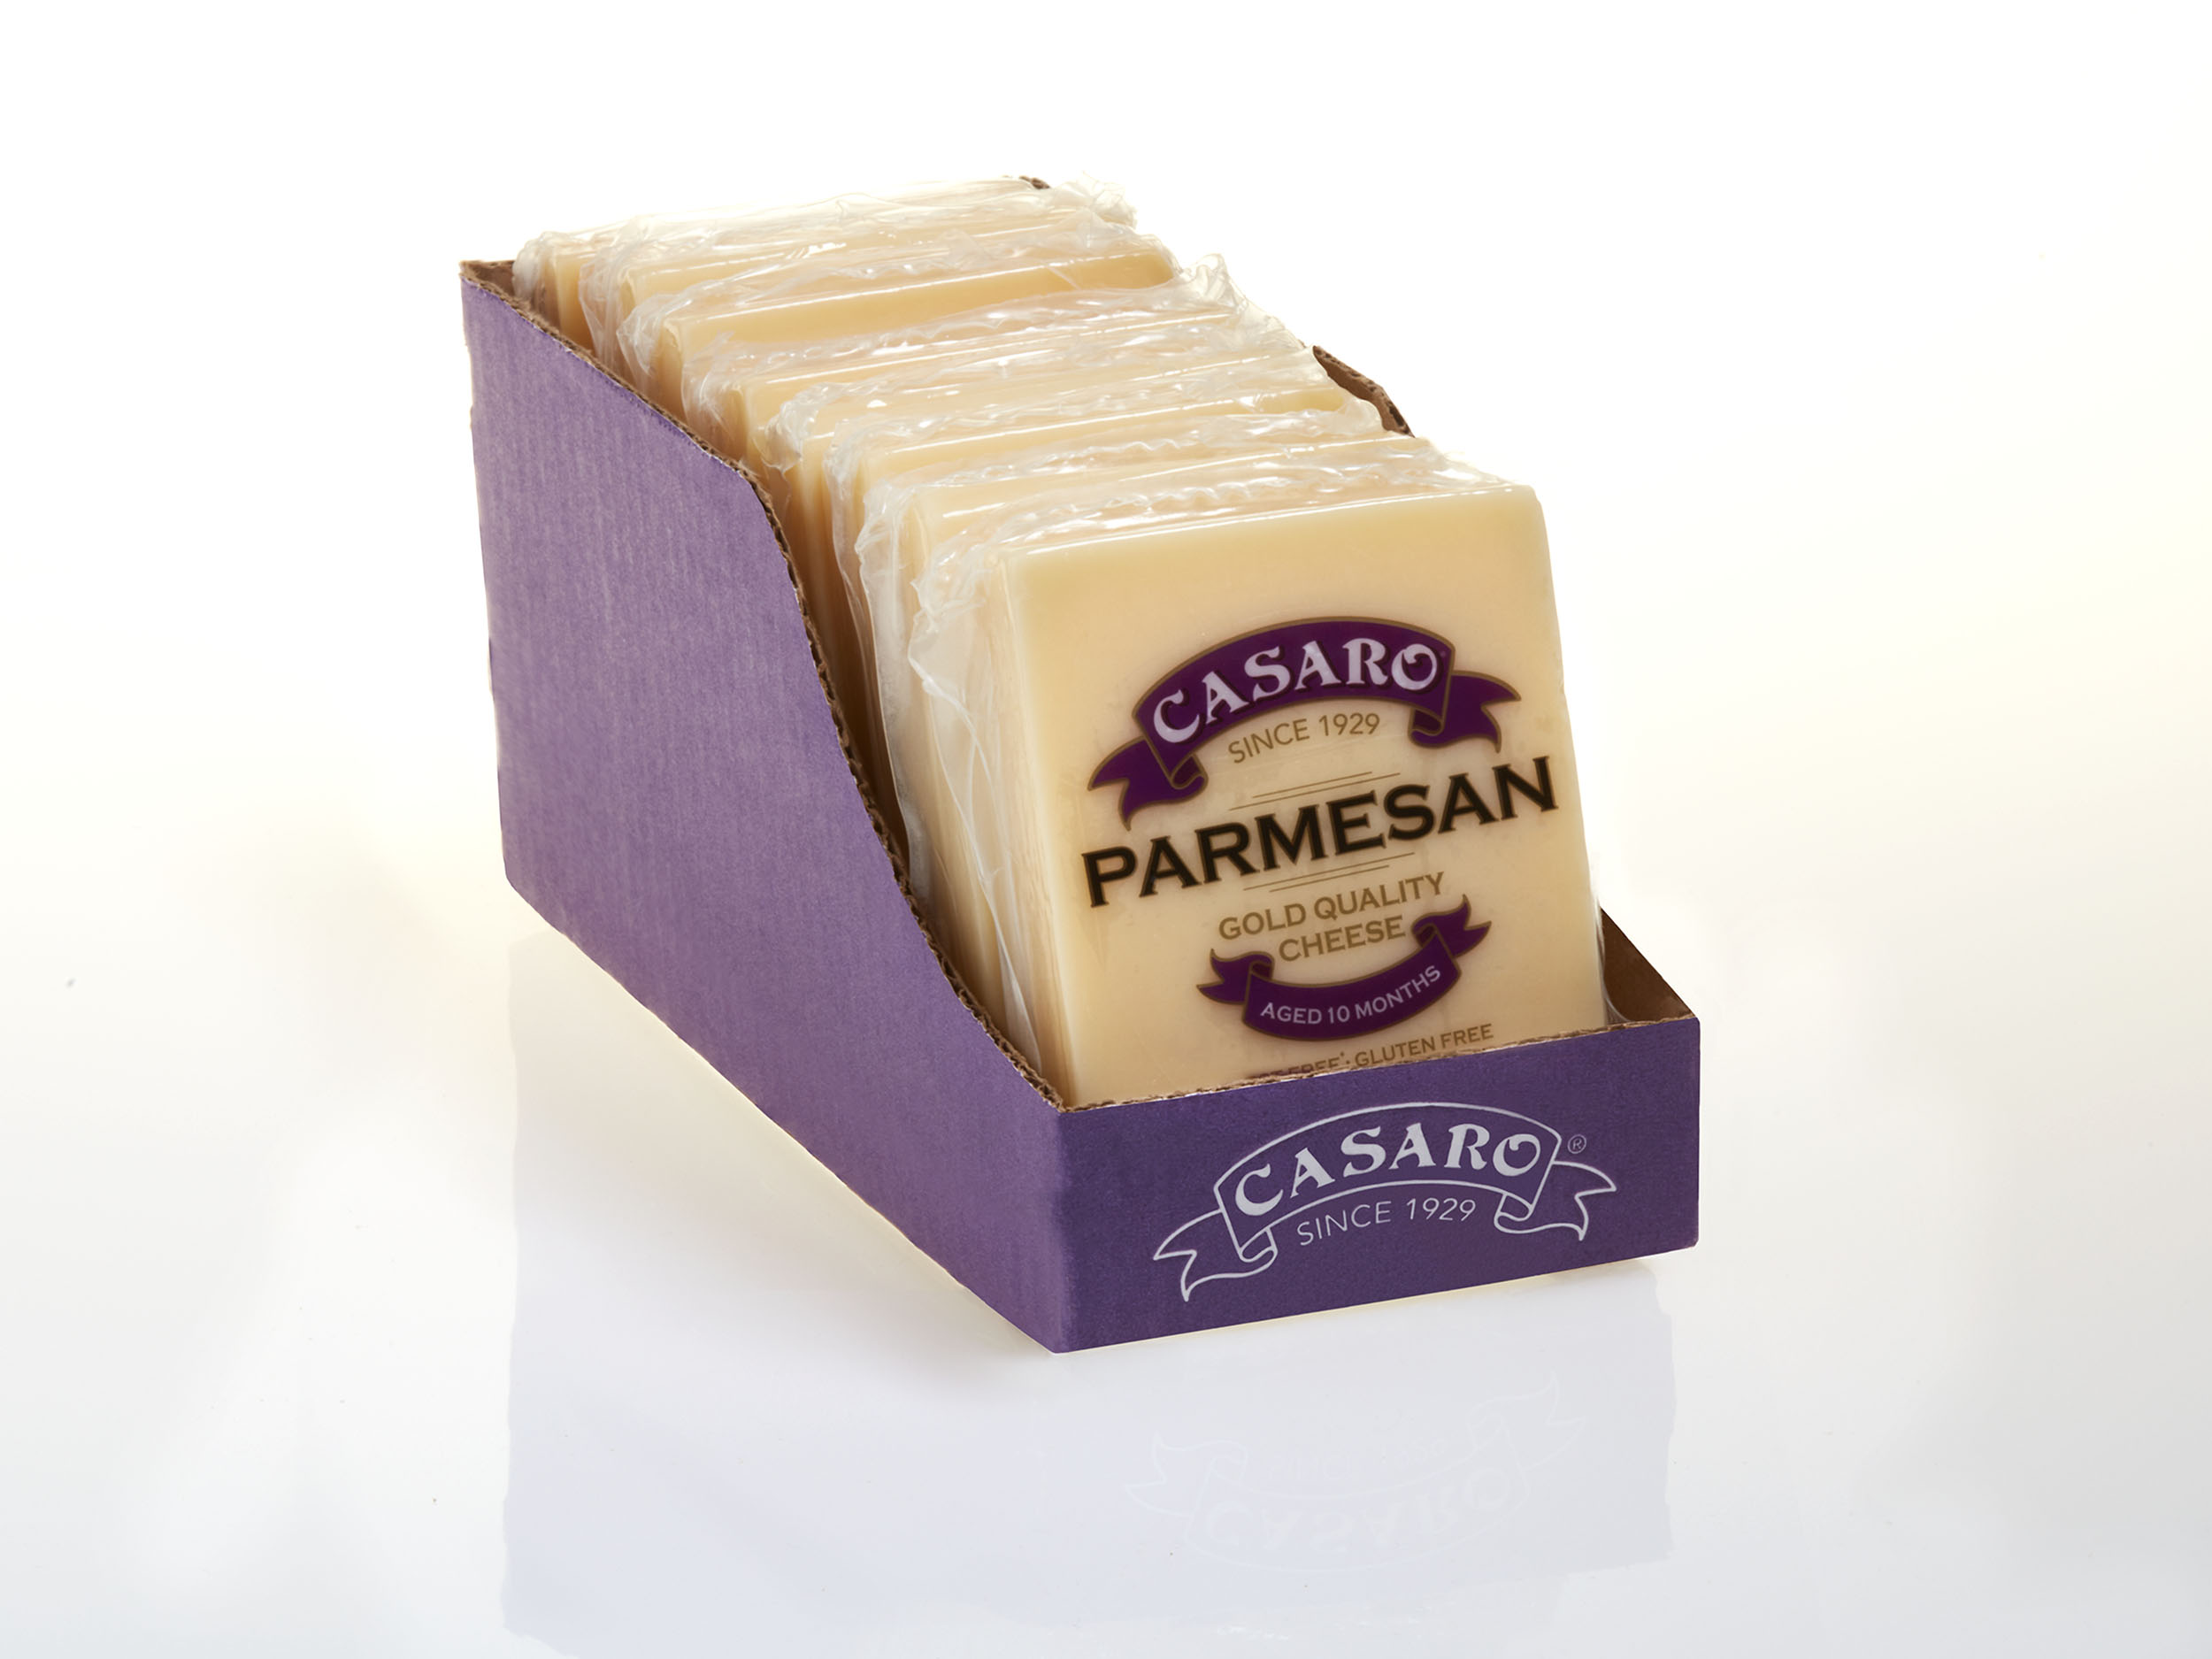 7 oz Casaro Parmesan Case.jpg